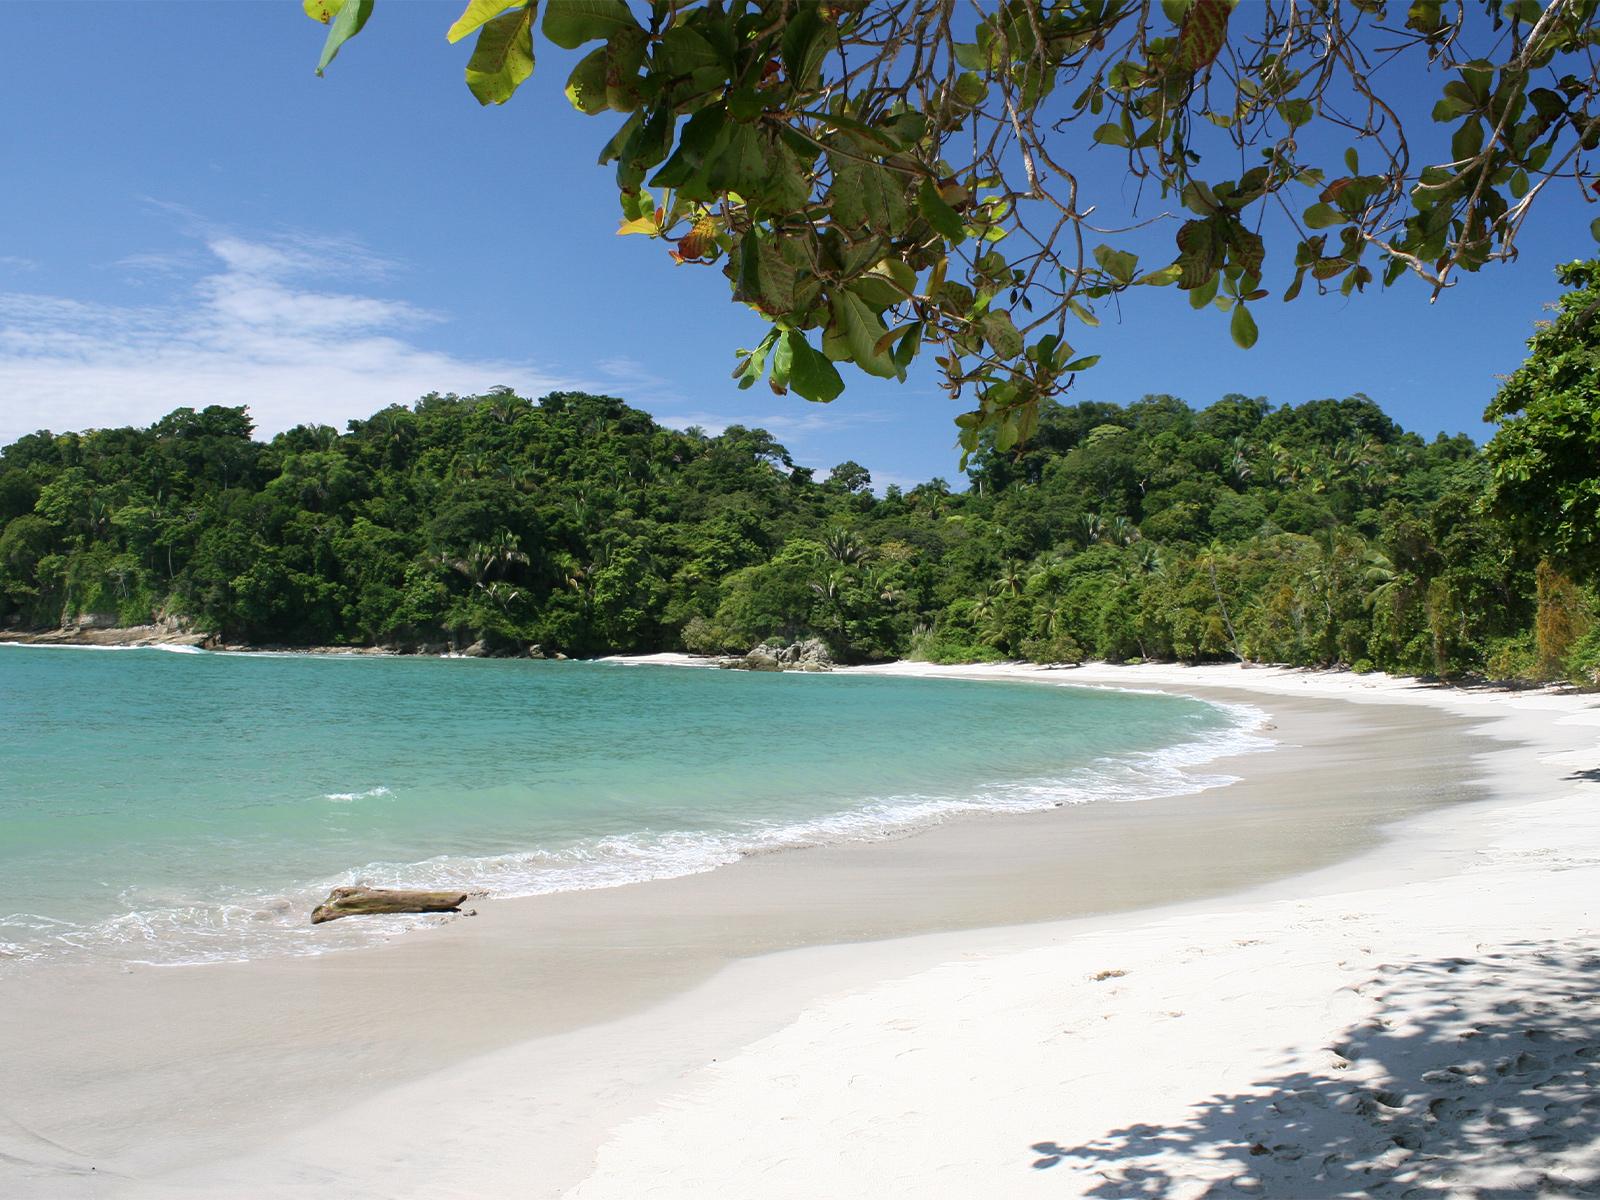 school_expedition_costa_rica_impact_white_beach